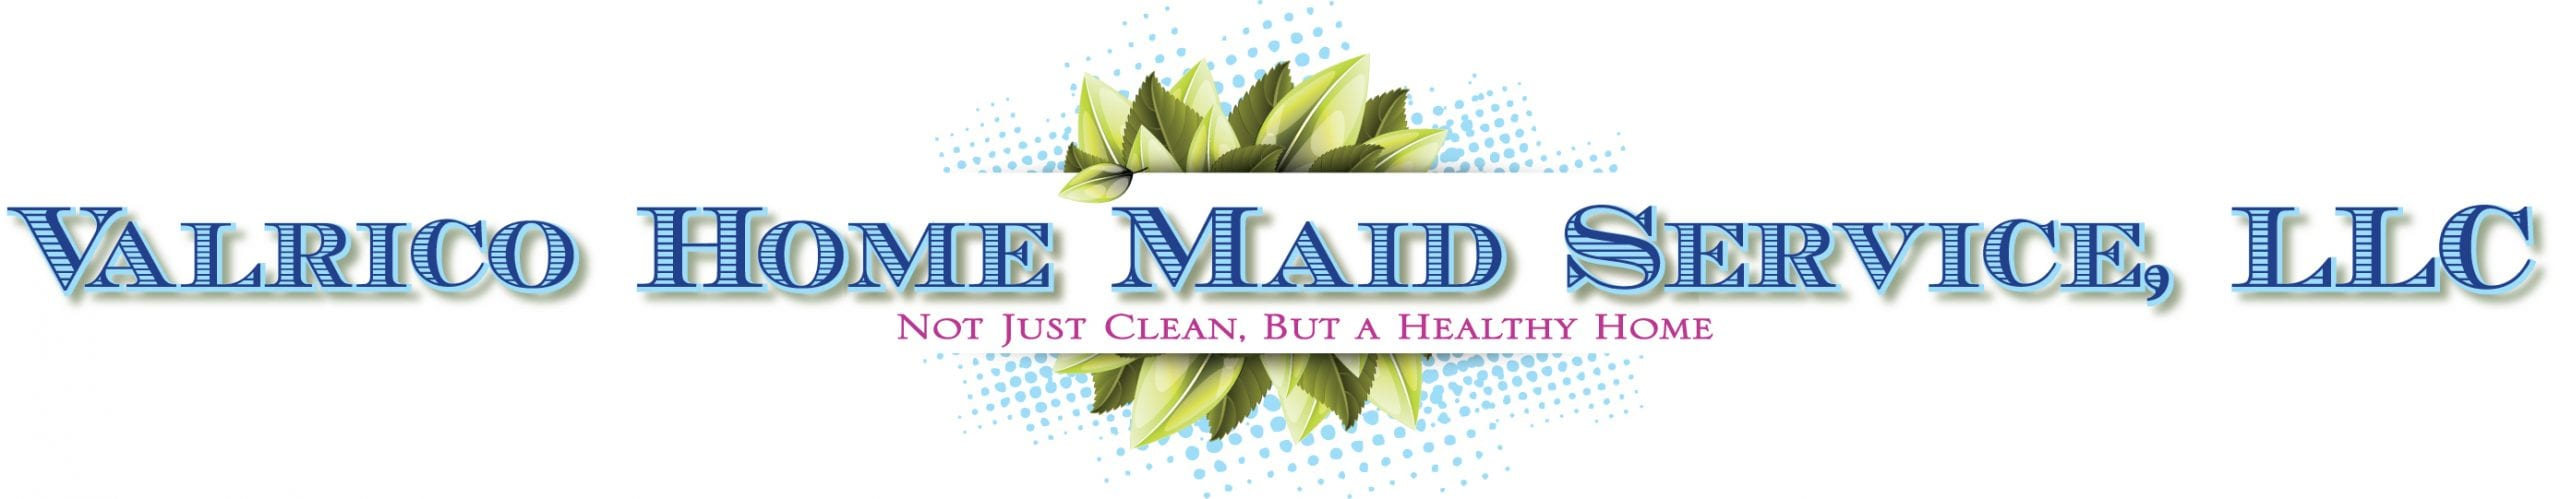 Valrico Home Maid Service